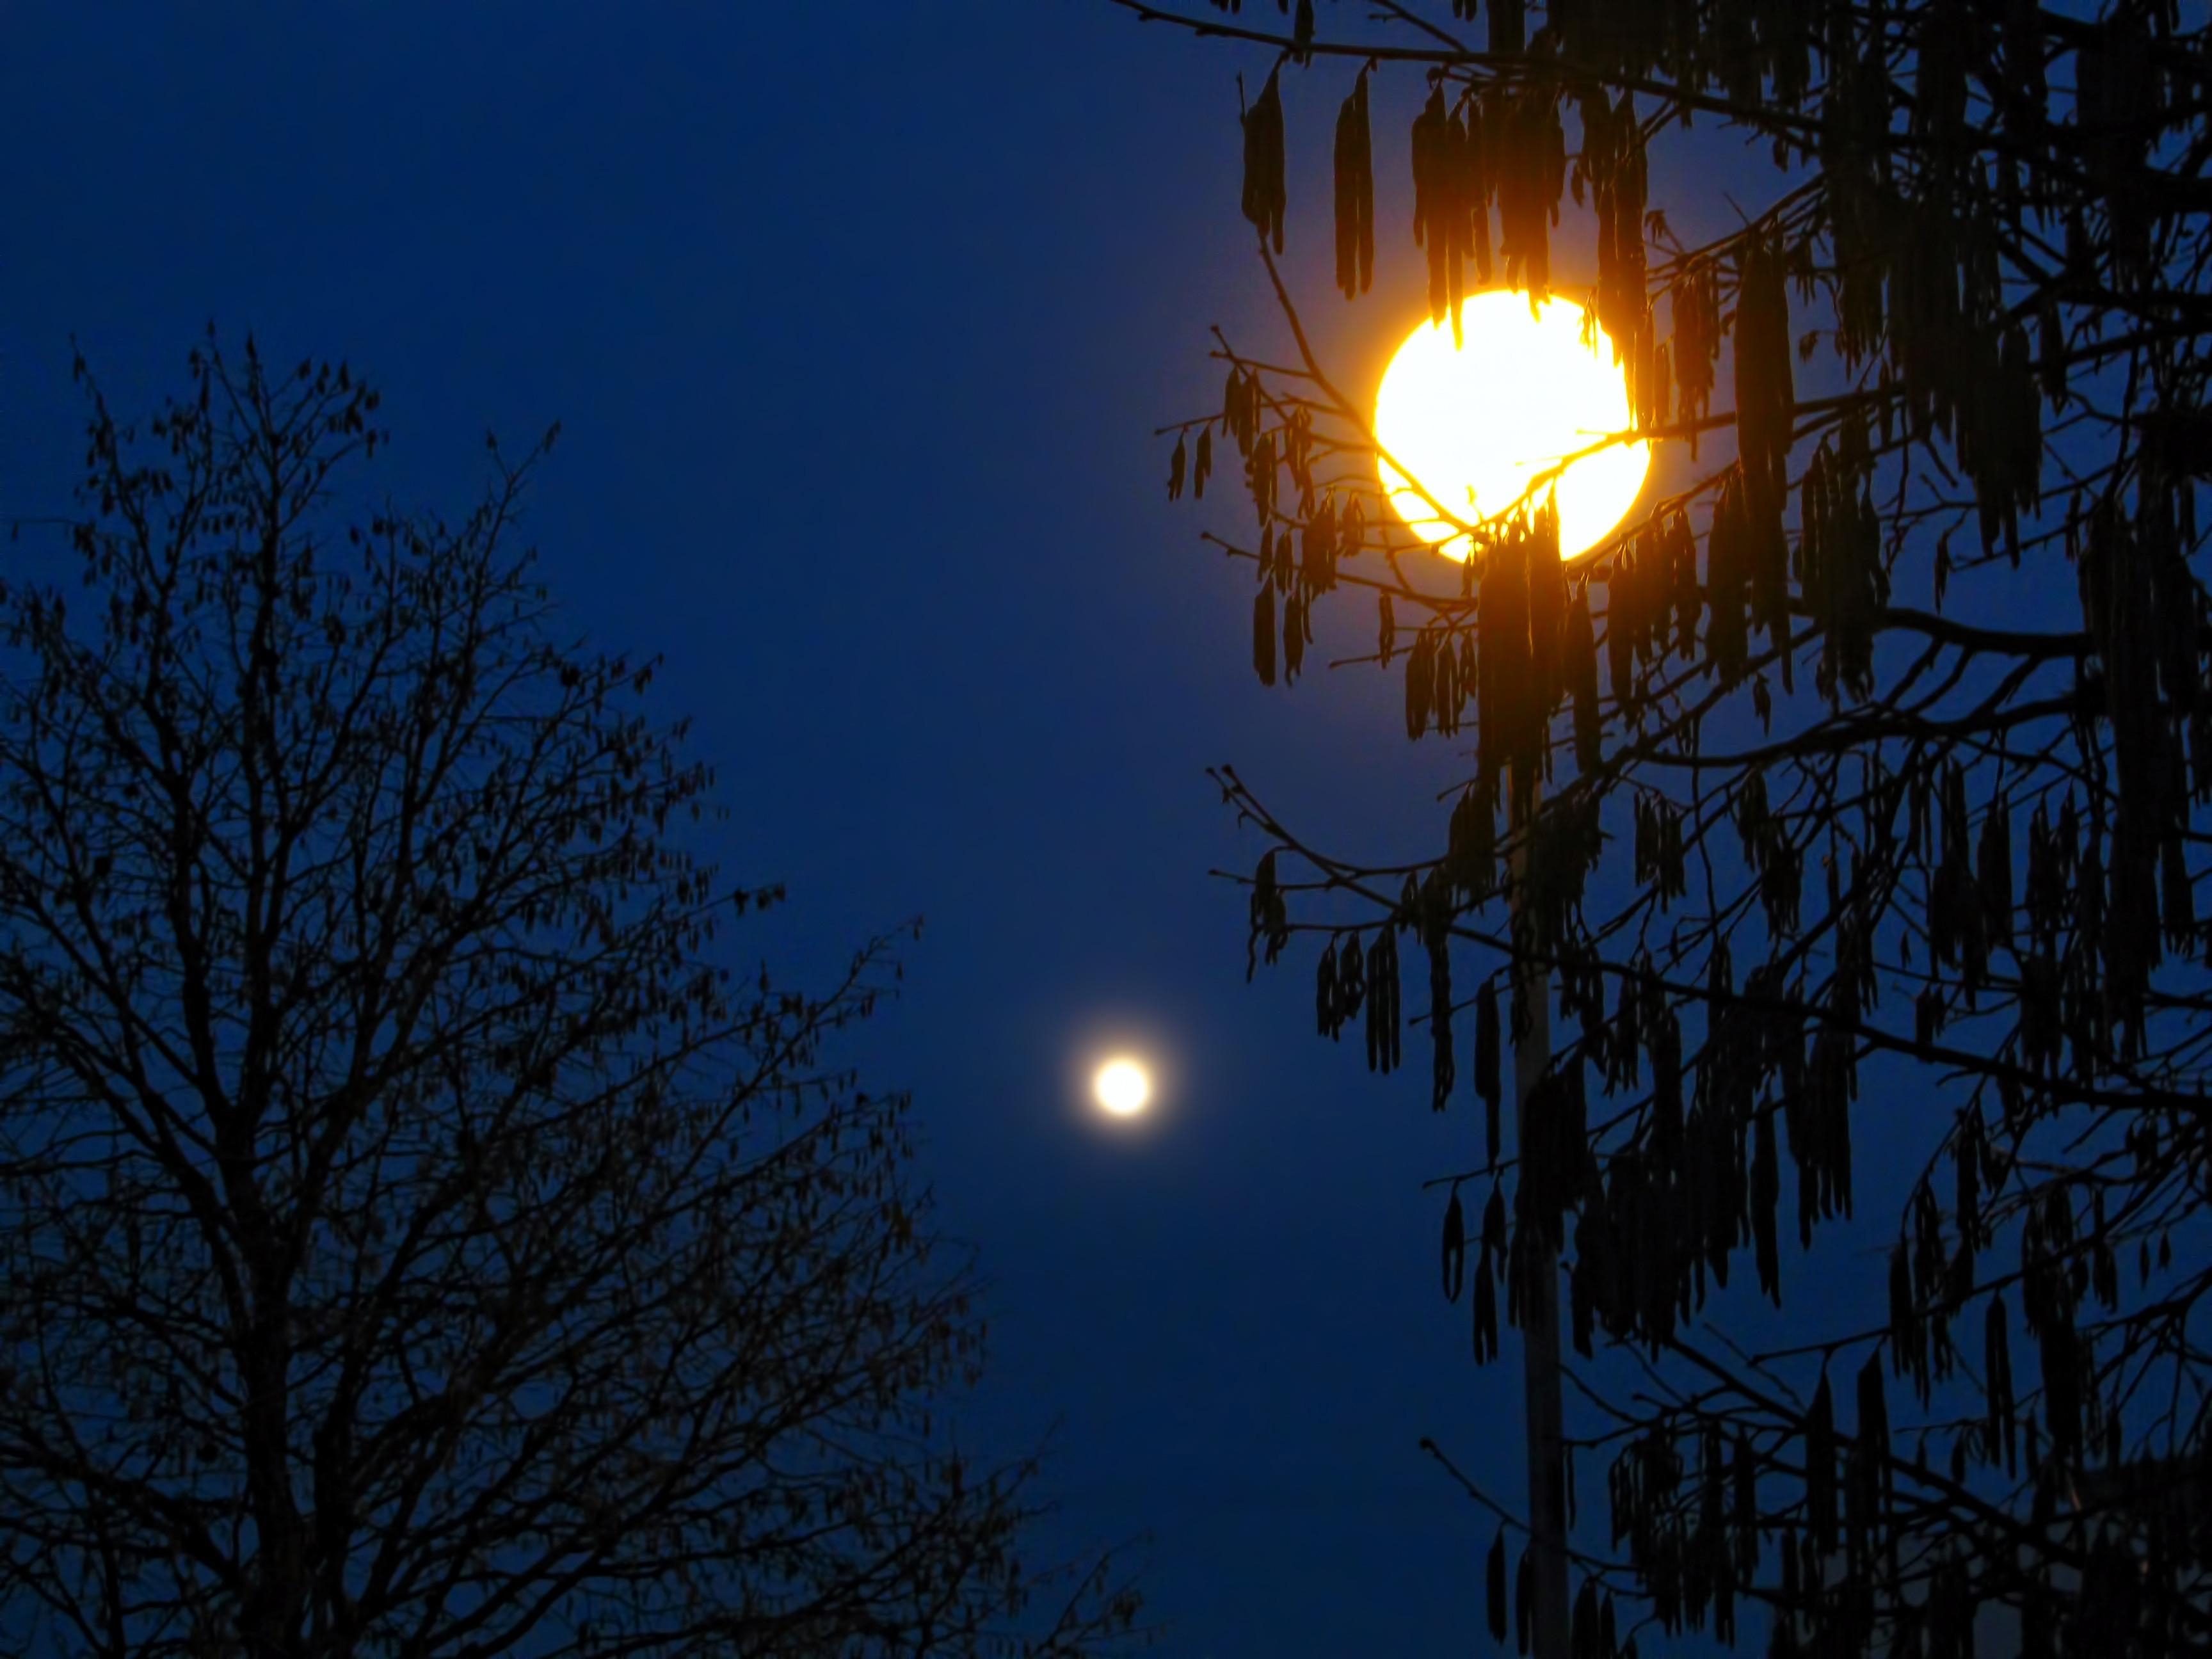 Fotos gratis rbol rama silueta ligero cielo puesta for Moonlight iluminacion